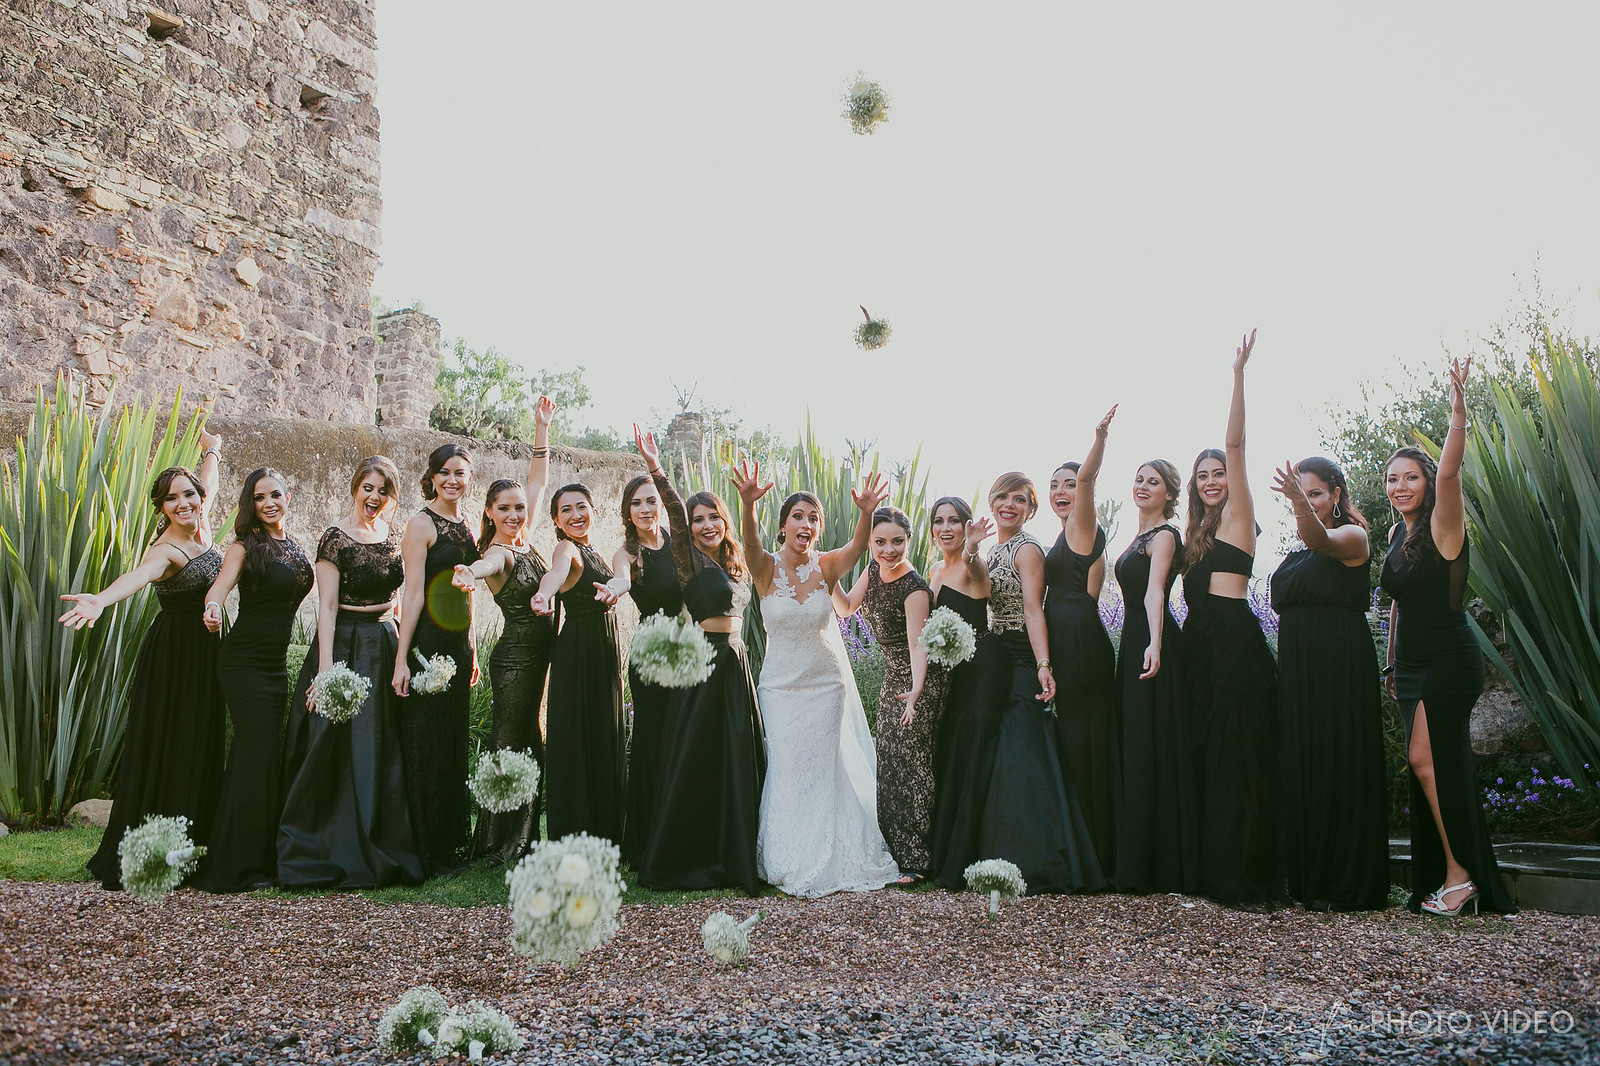 LifePhotoVideo_Boda_Guanajuato_Wedding_0030